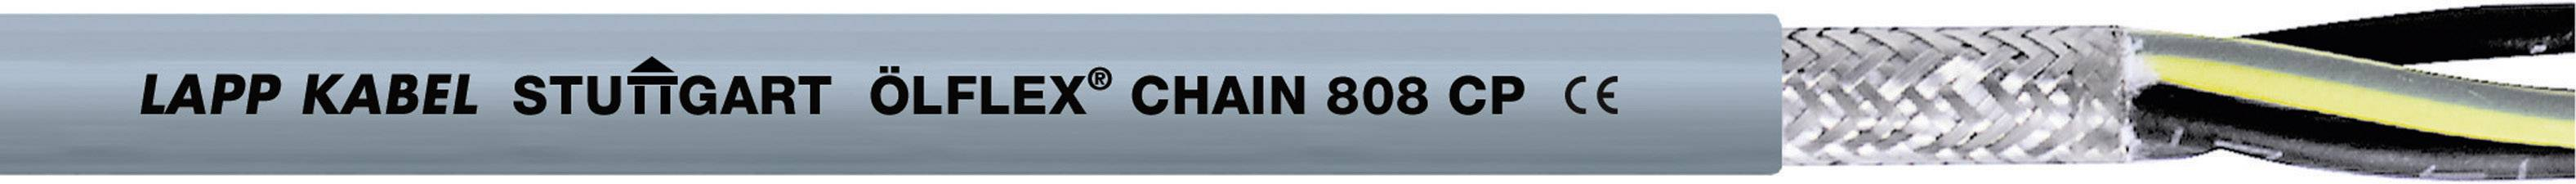 Žíla kabelu LappKabel ÖLFLEX CHAIN 808 CP 4G0,75 (1027761), 4x 0,75 mm², polyurethan, Ø 7,1 mm, stíněný, 100 m